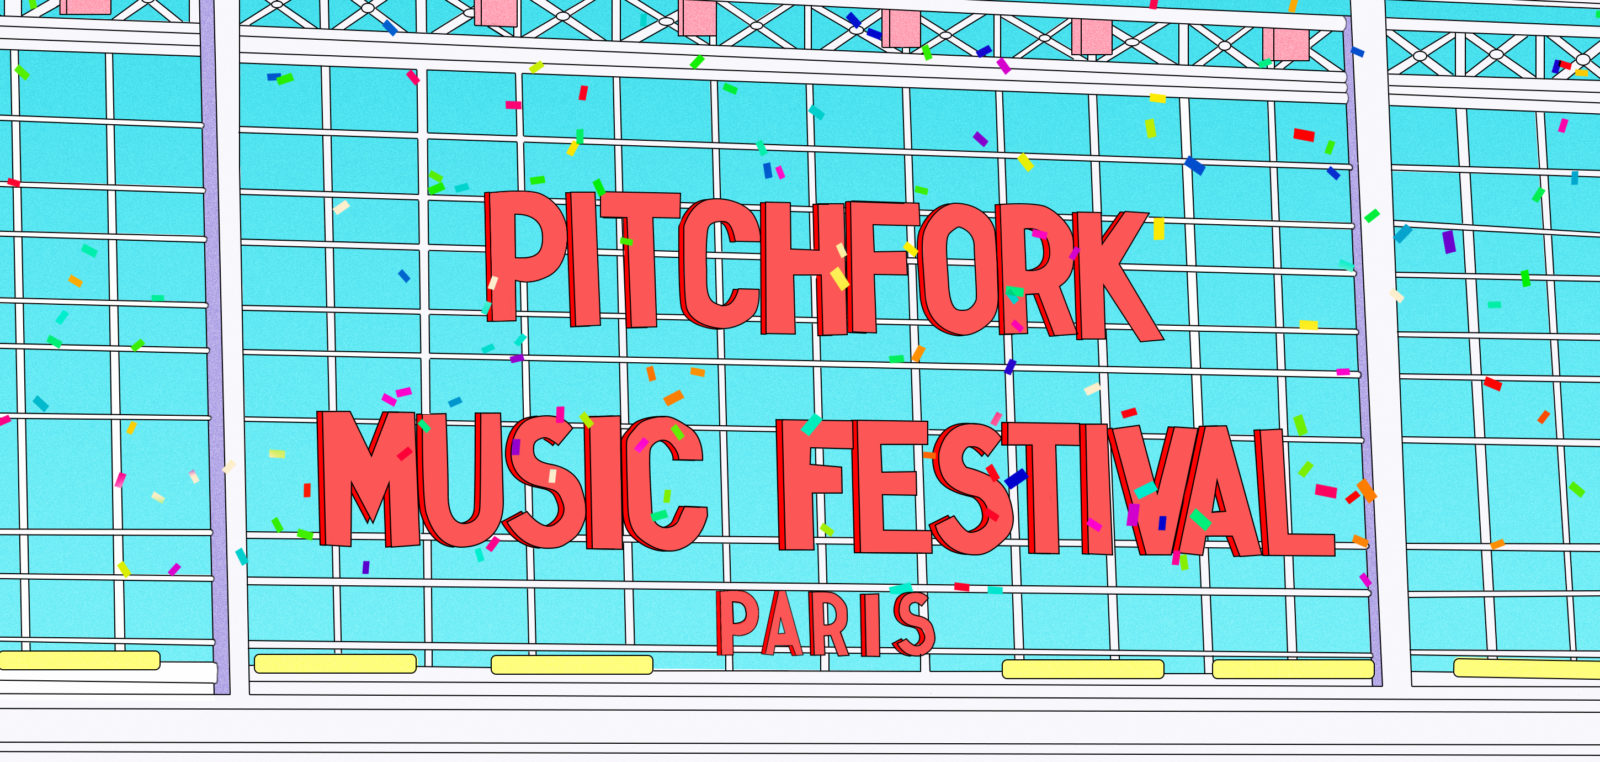 [Kiblind Live] Pitchfork Music Festival Paris 2018